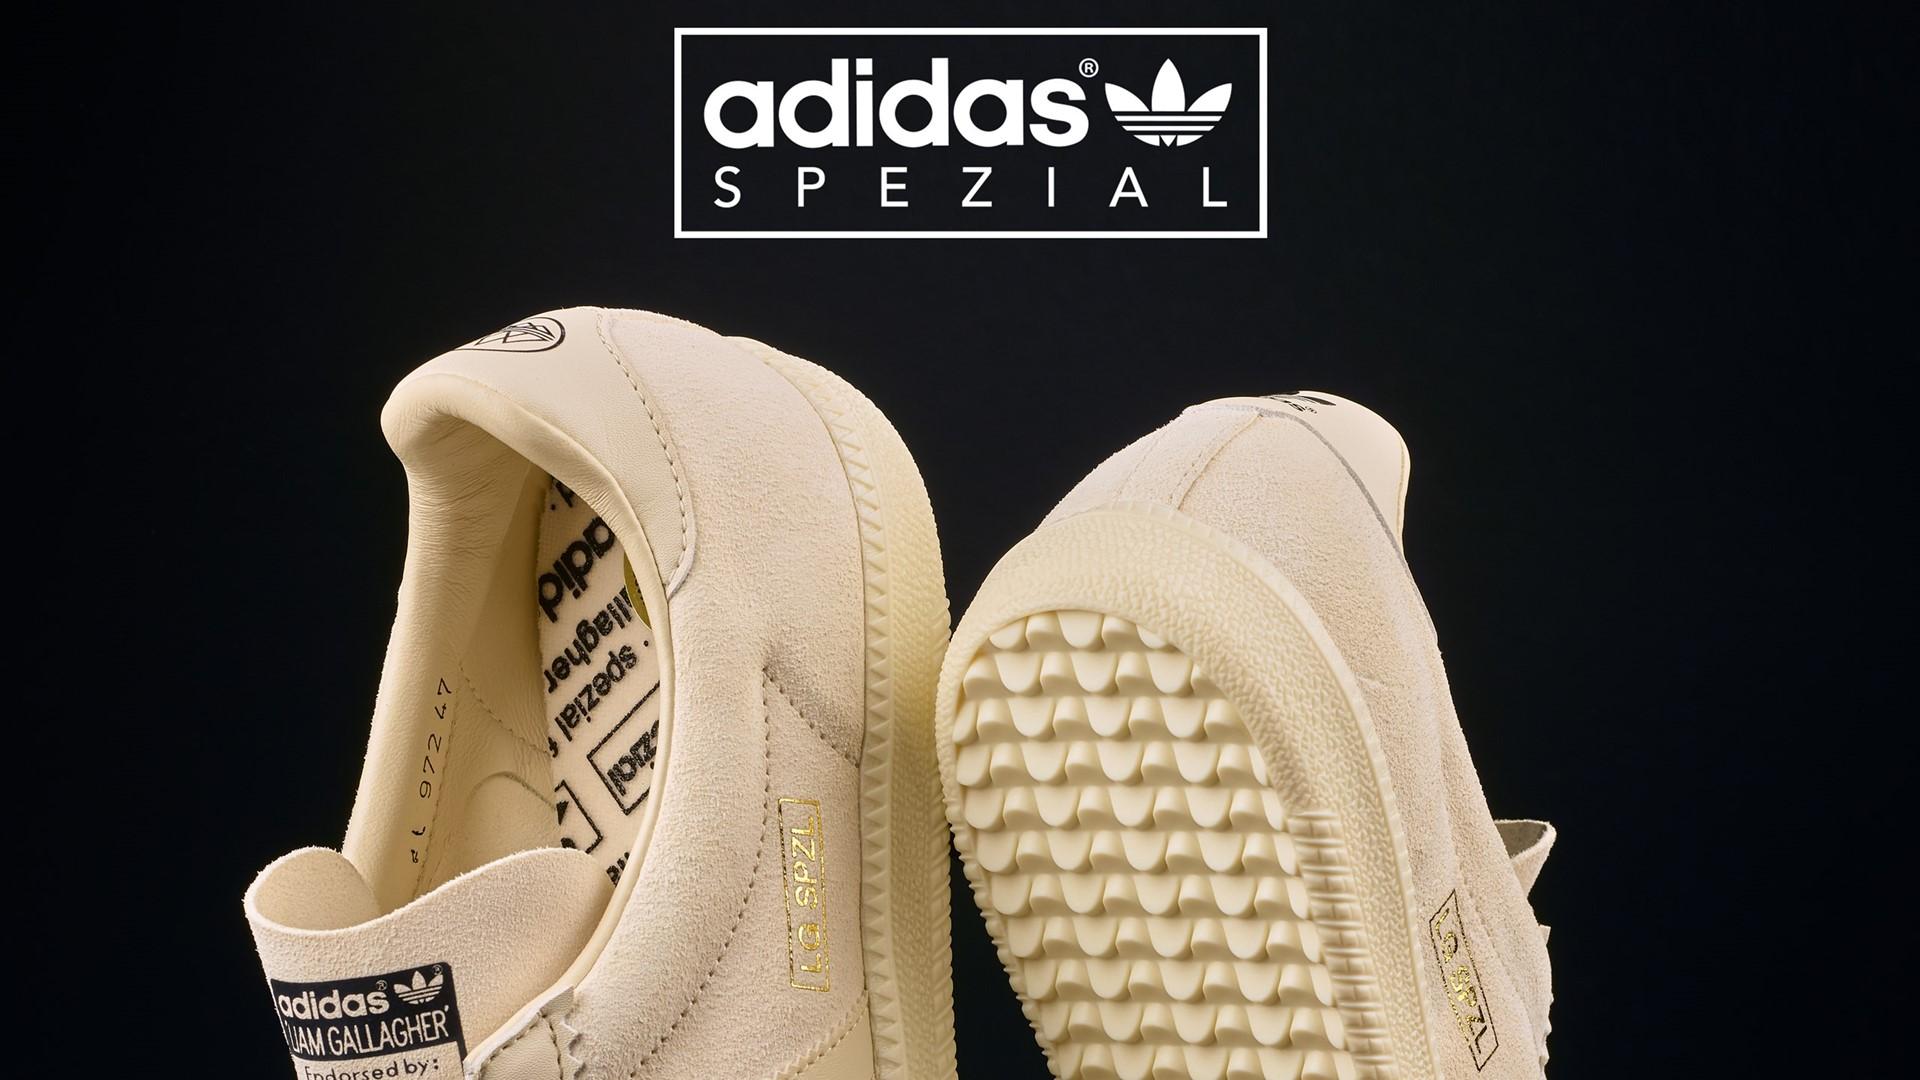 adidas SPEZIAL unveils the LG SPZL